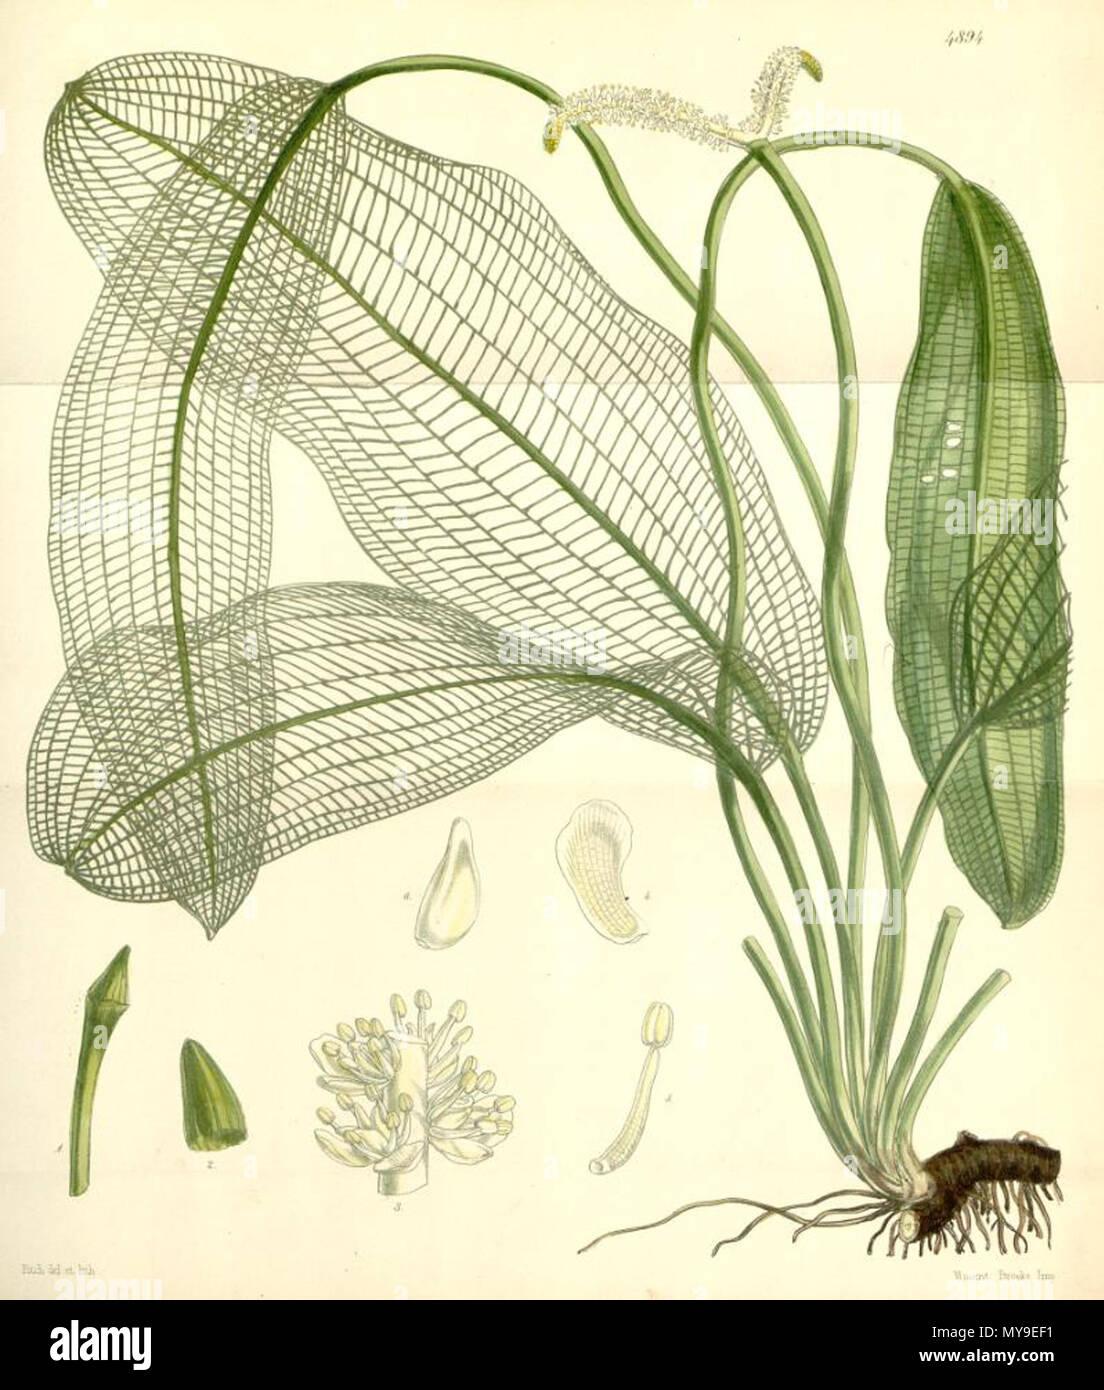 . Illustration of Aponogeton madgascariensis (Syn. Ouvirandra fenestralis) . 1856. Sir William Jackson Hooker (1785 - 1865) 46 Aponogeton madagascariensis - Stock Image